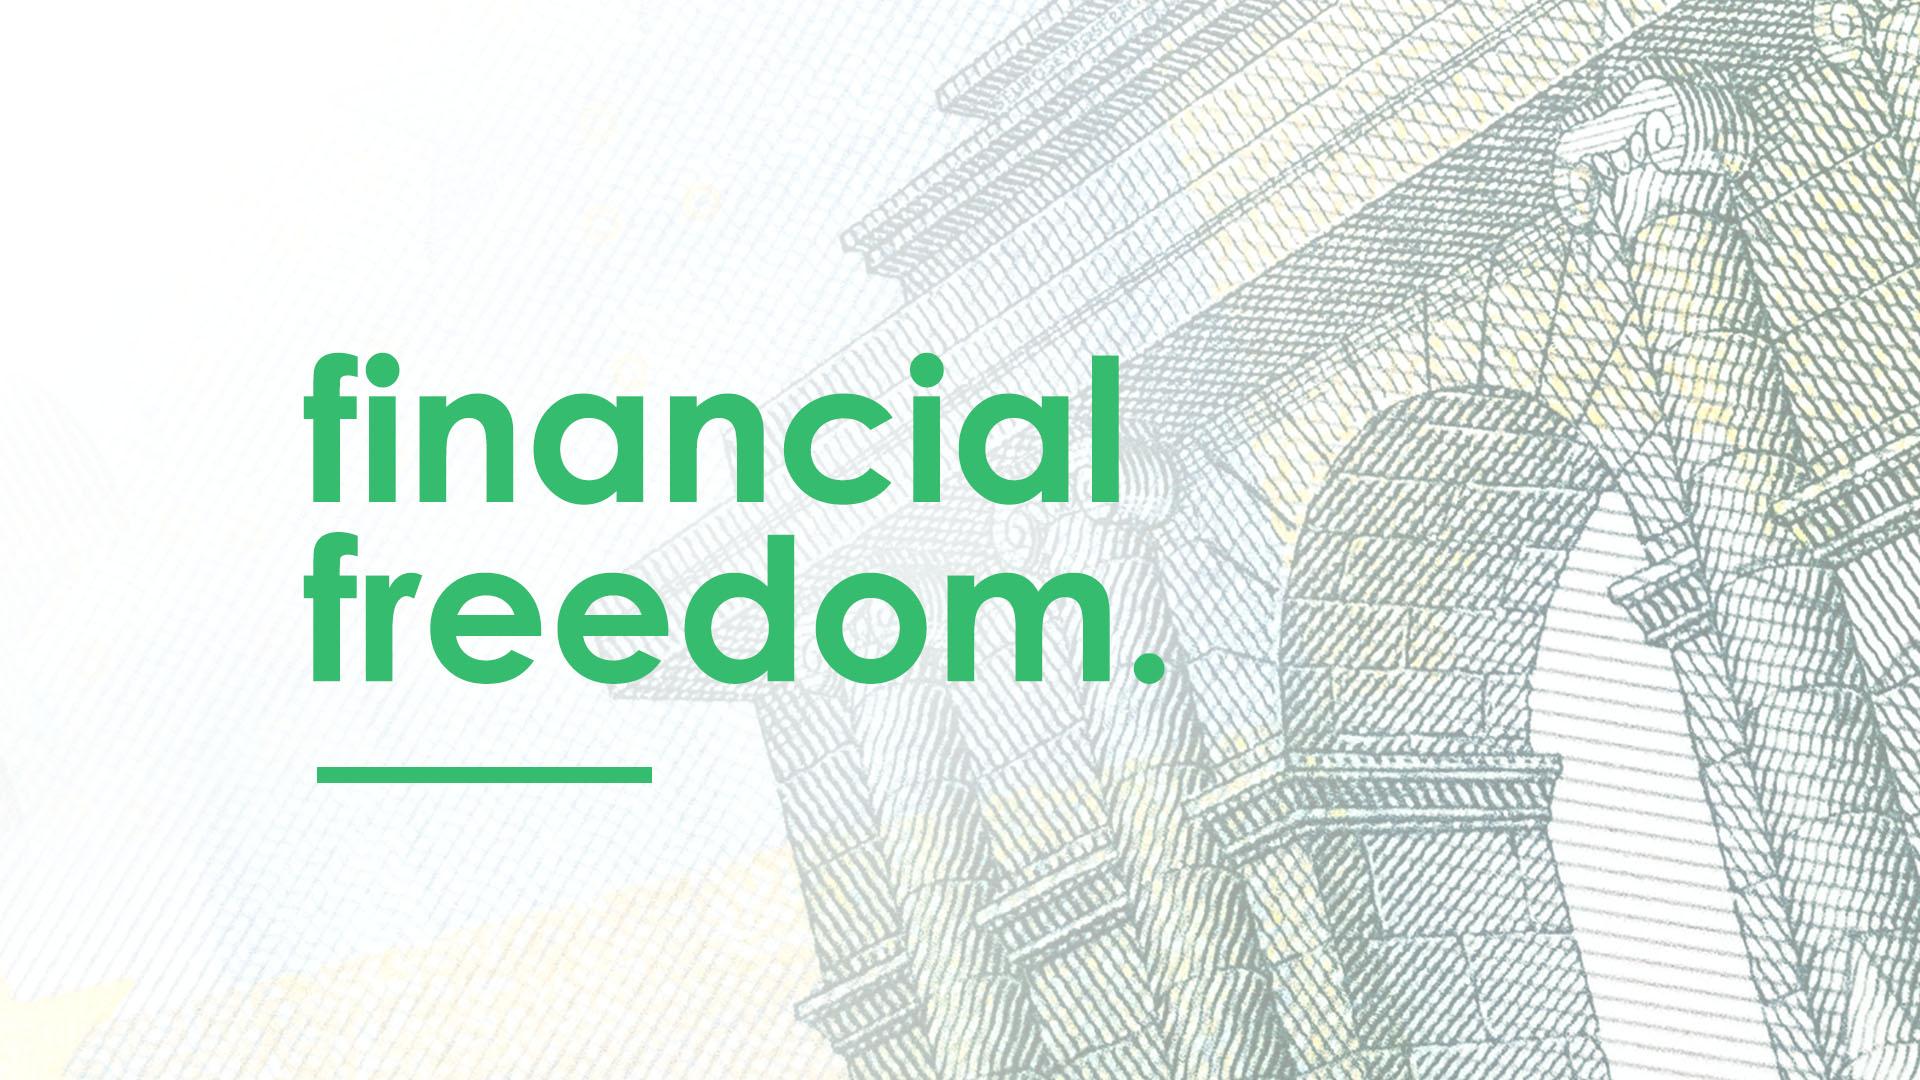 Financial Freedom Web Image.jpg